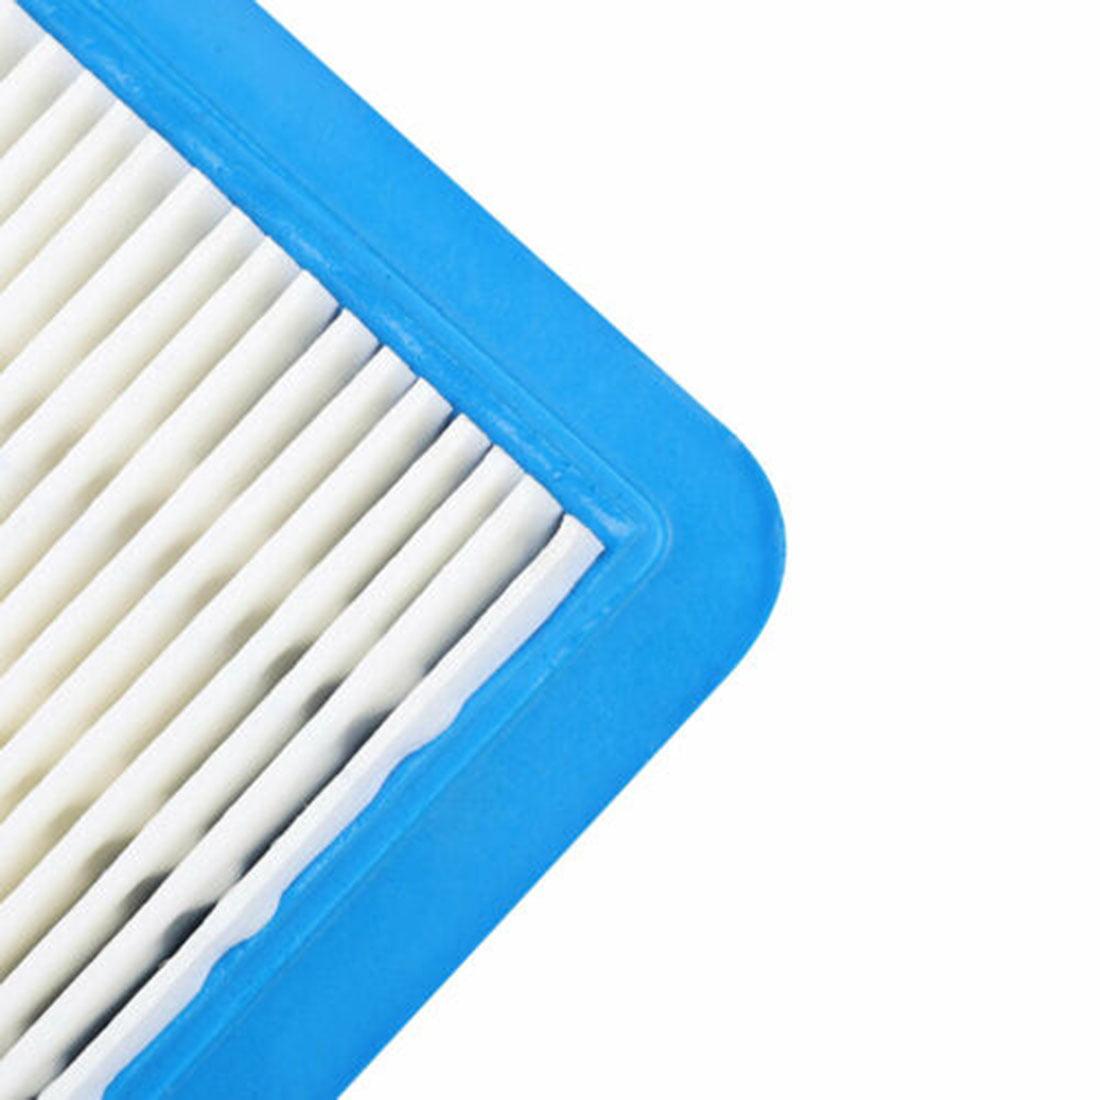 5Pcs Lawn Mower Air Filter Replacement For Craftsman Toro